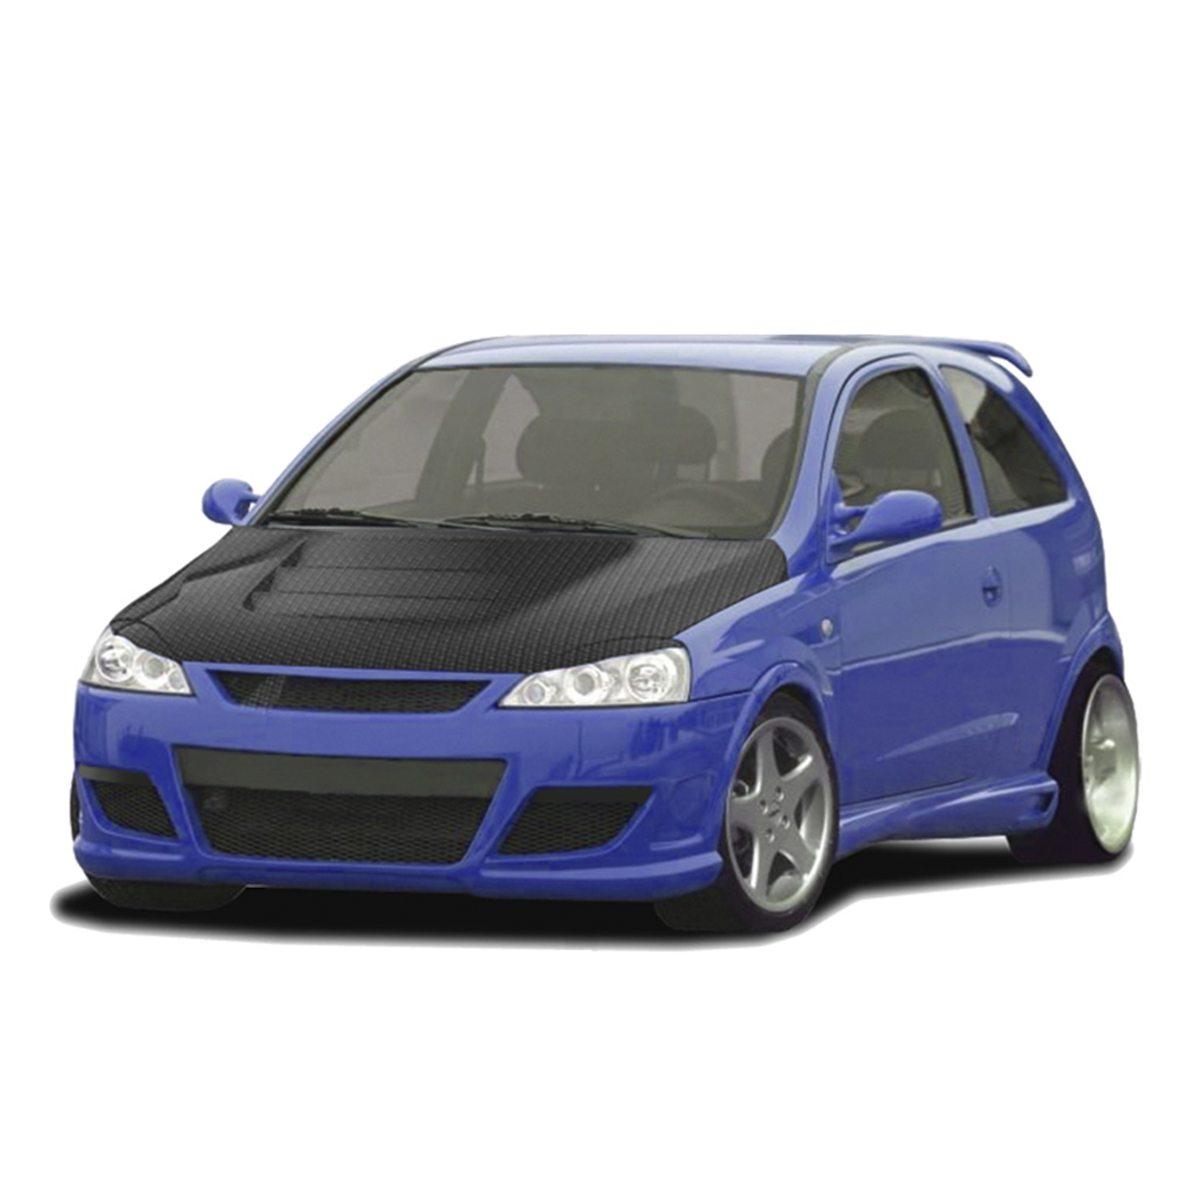 Opel-Corsa-C-West-Frt-PCA028.5